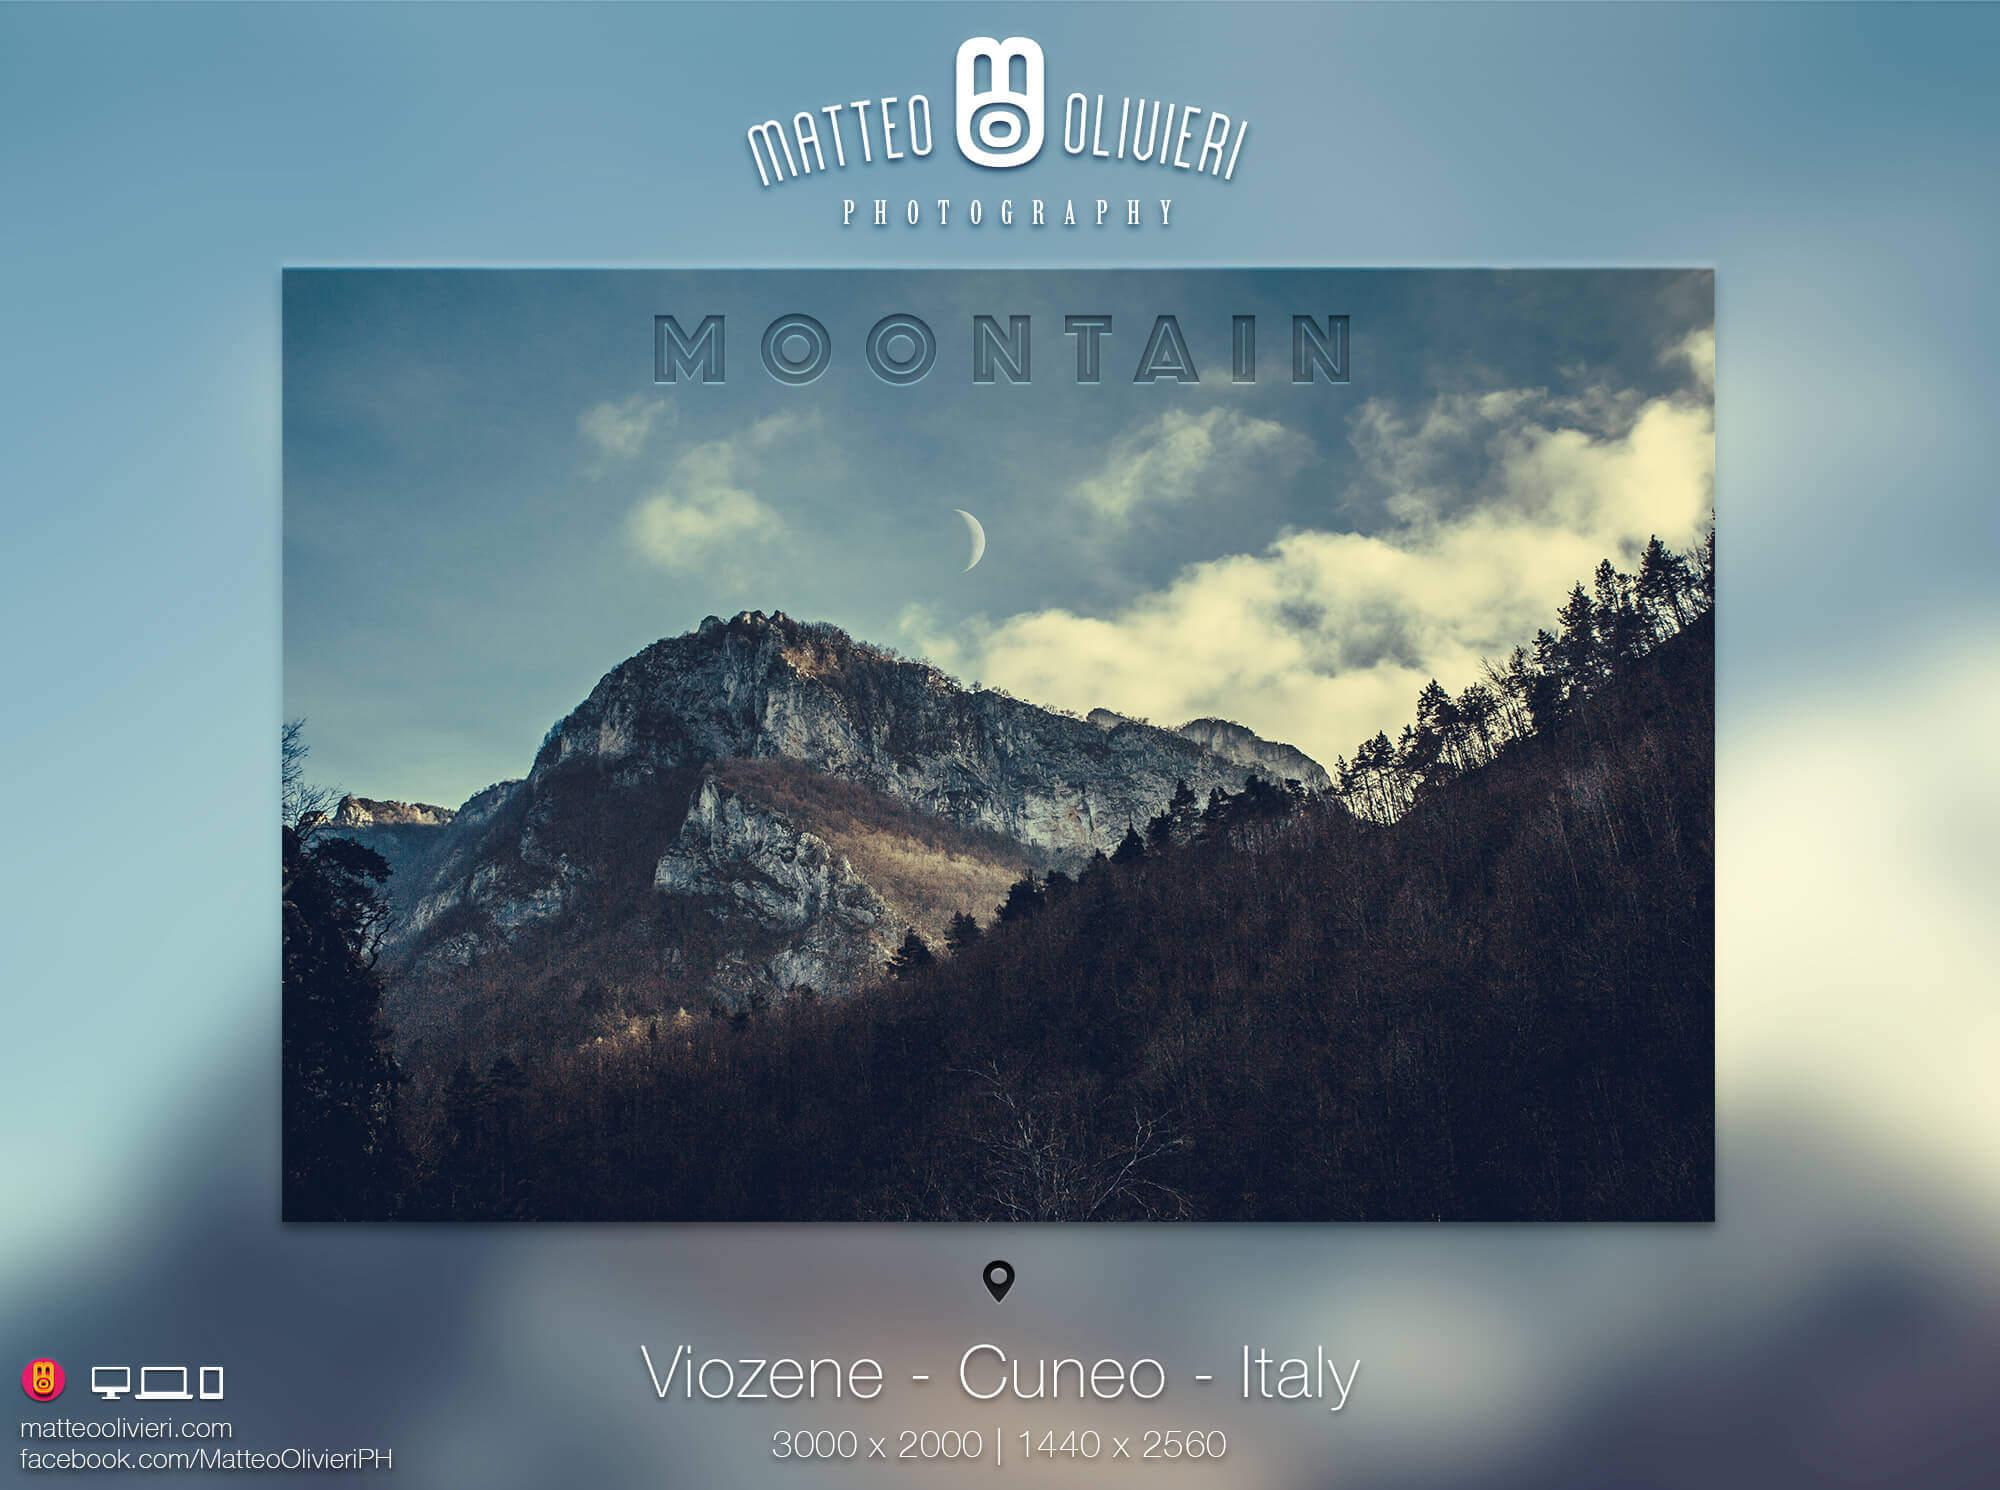 Moontain